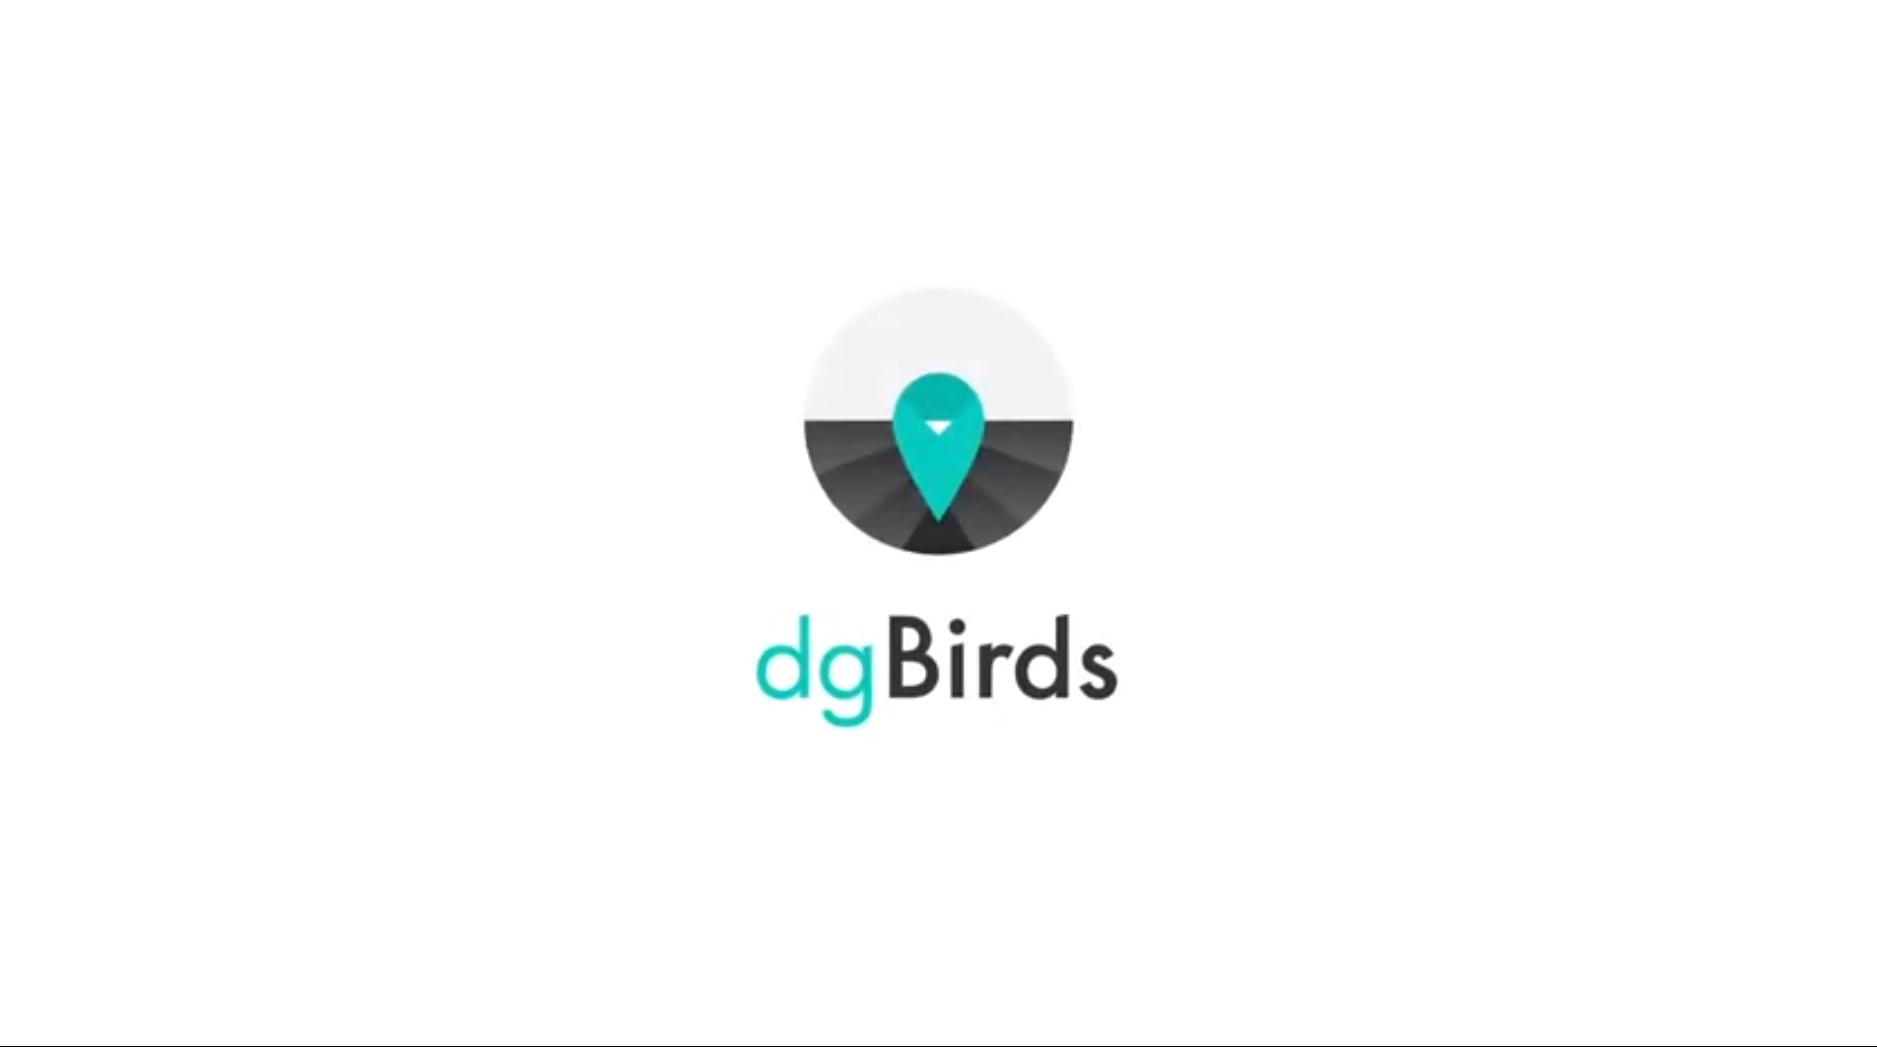 Dgbirds